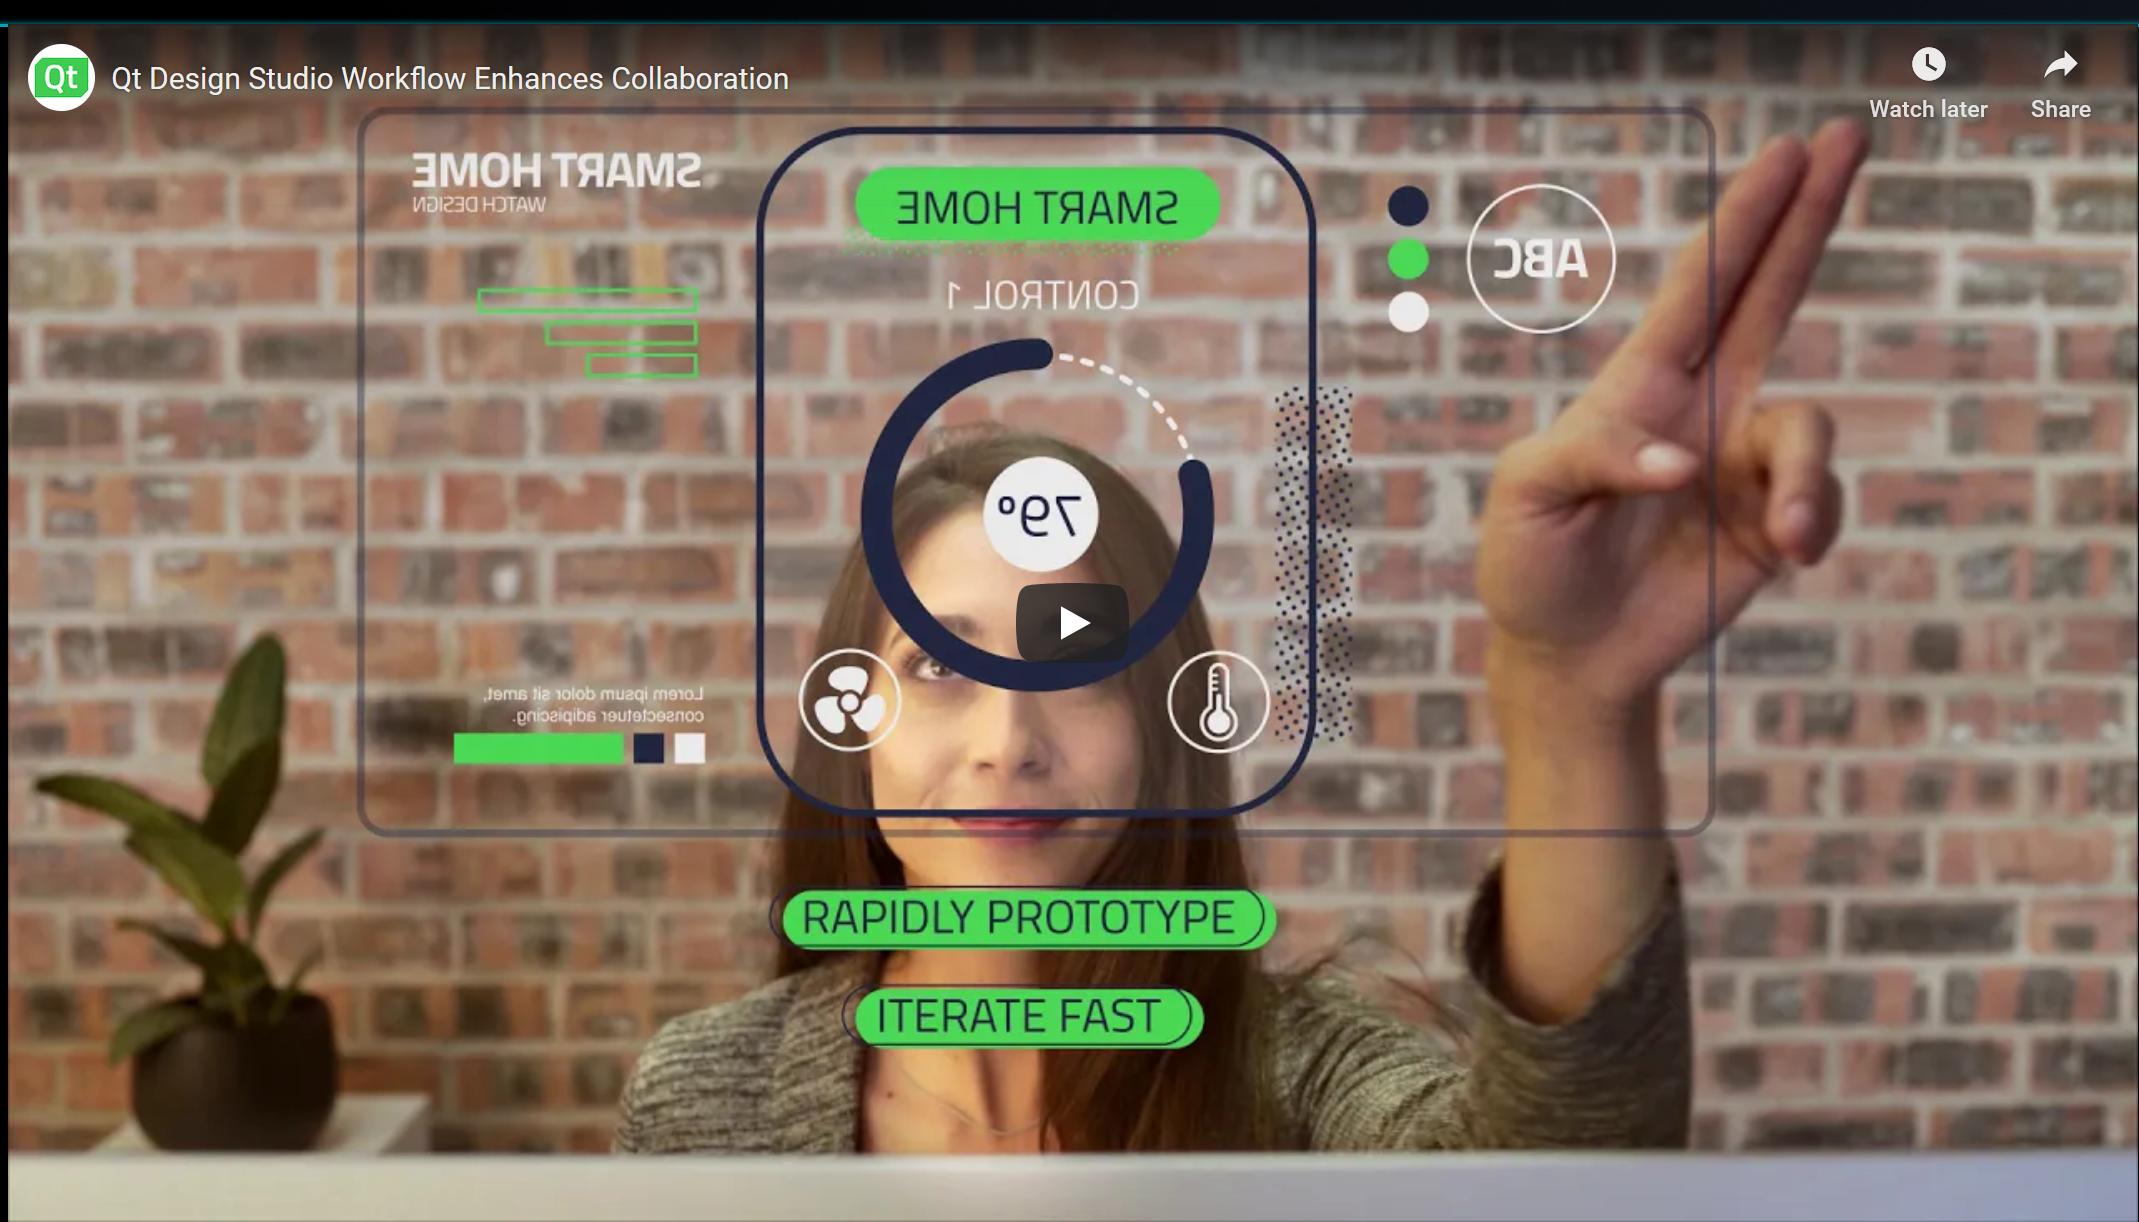 Qt Design Studio Intro Video Screenshot